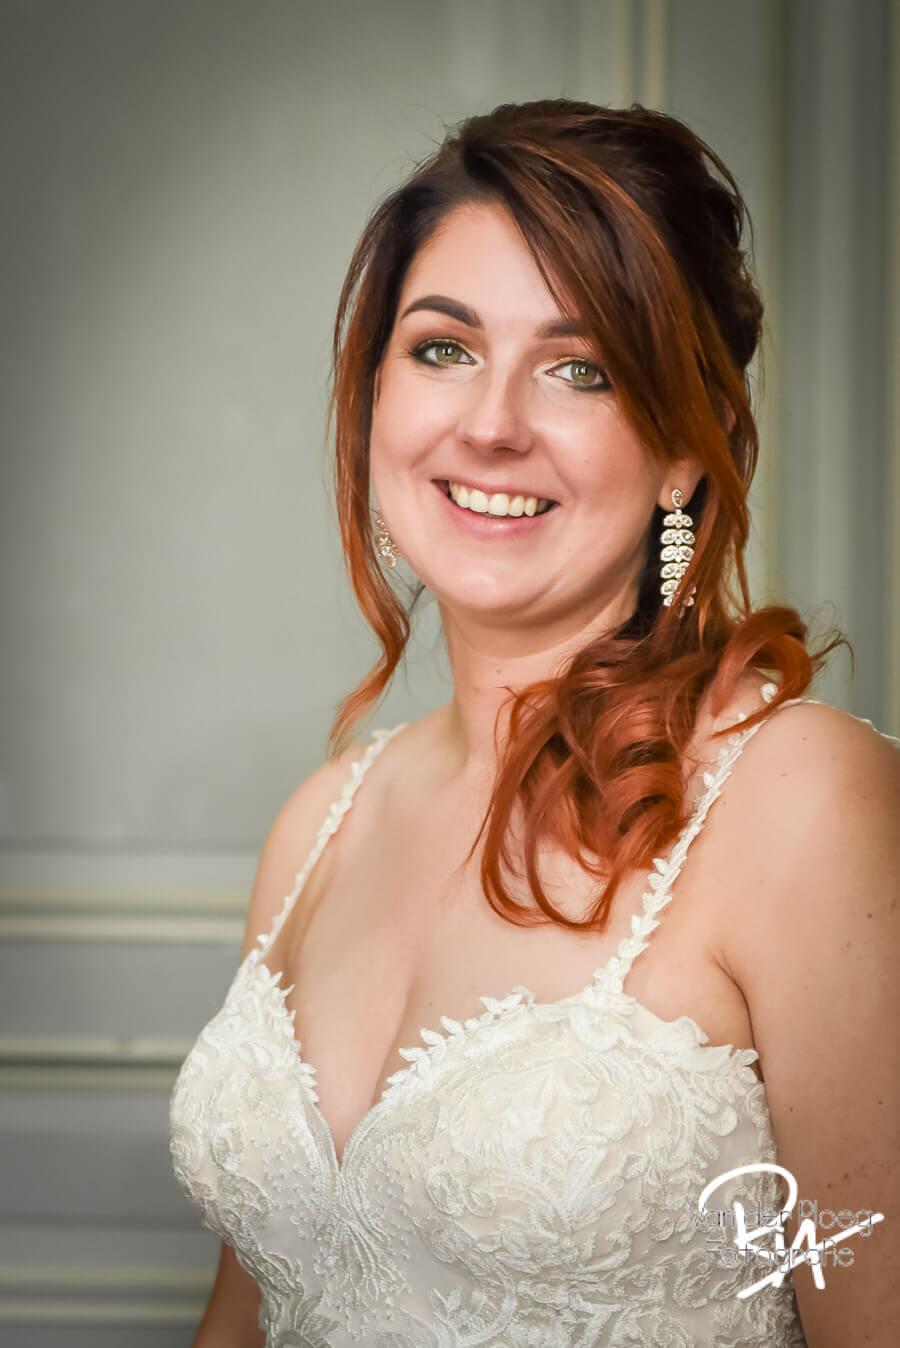 Trouwfoto bruid fotograaf Mierlo